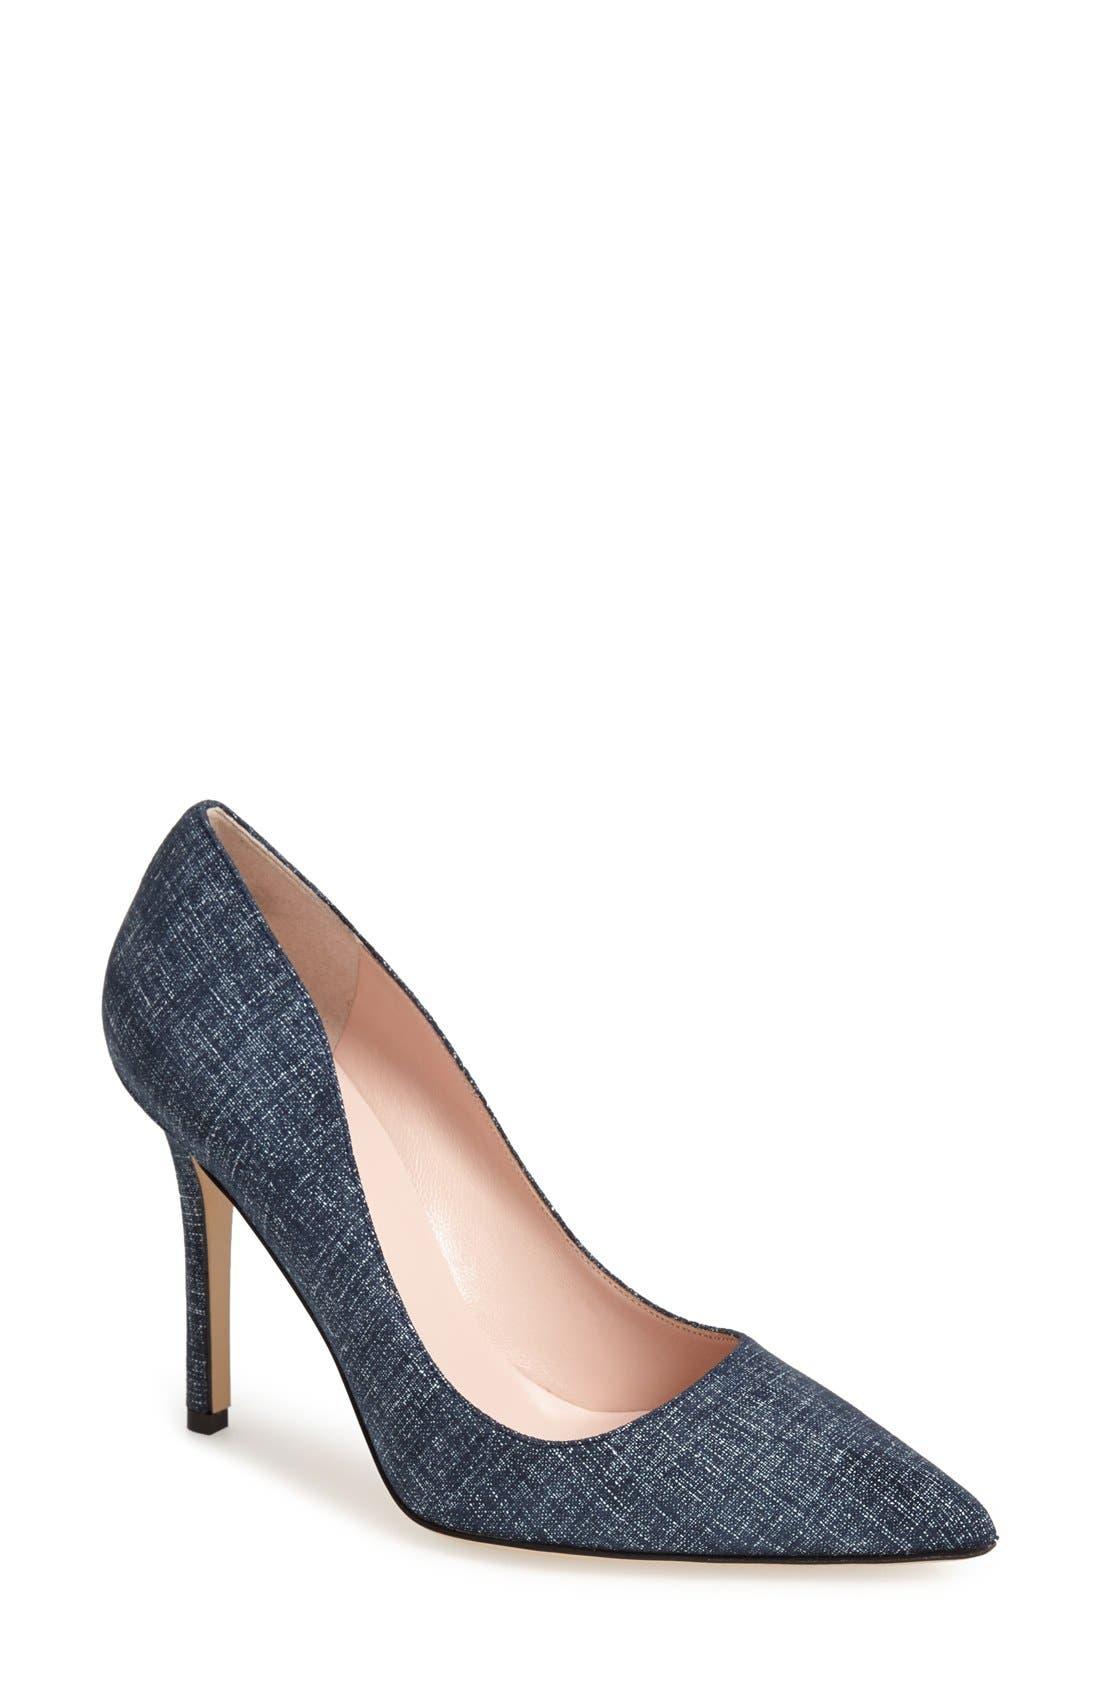 Main Image - kate spade new york 'larisa' pointy toe pump (Women)